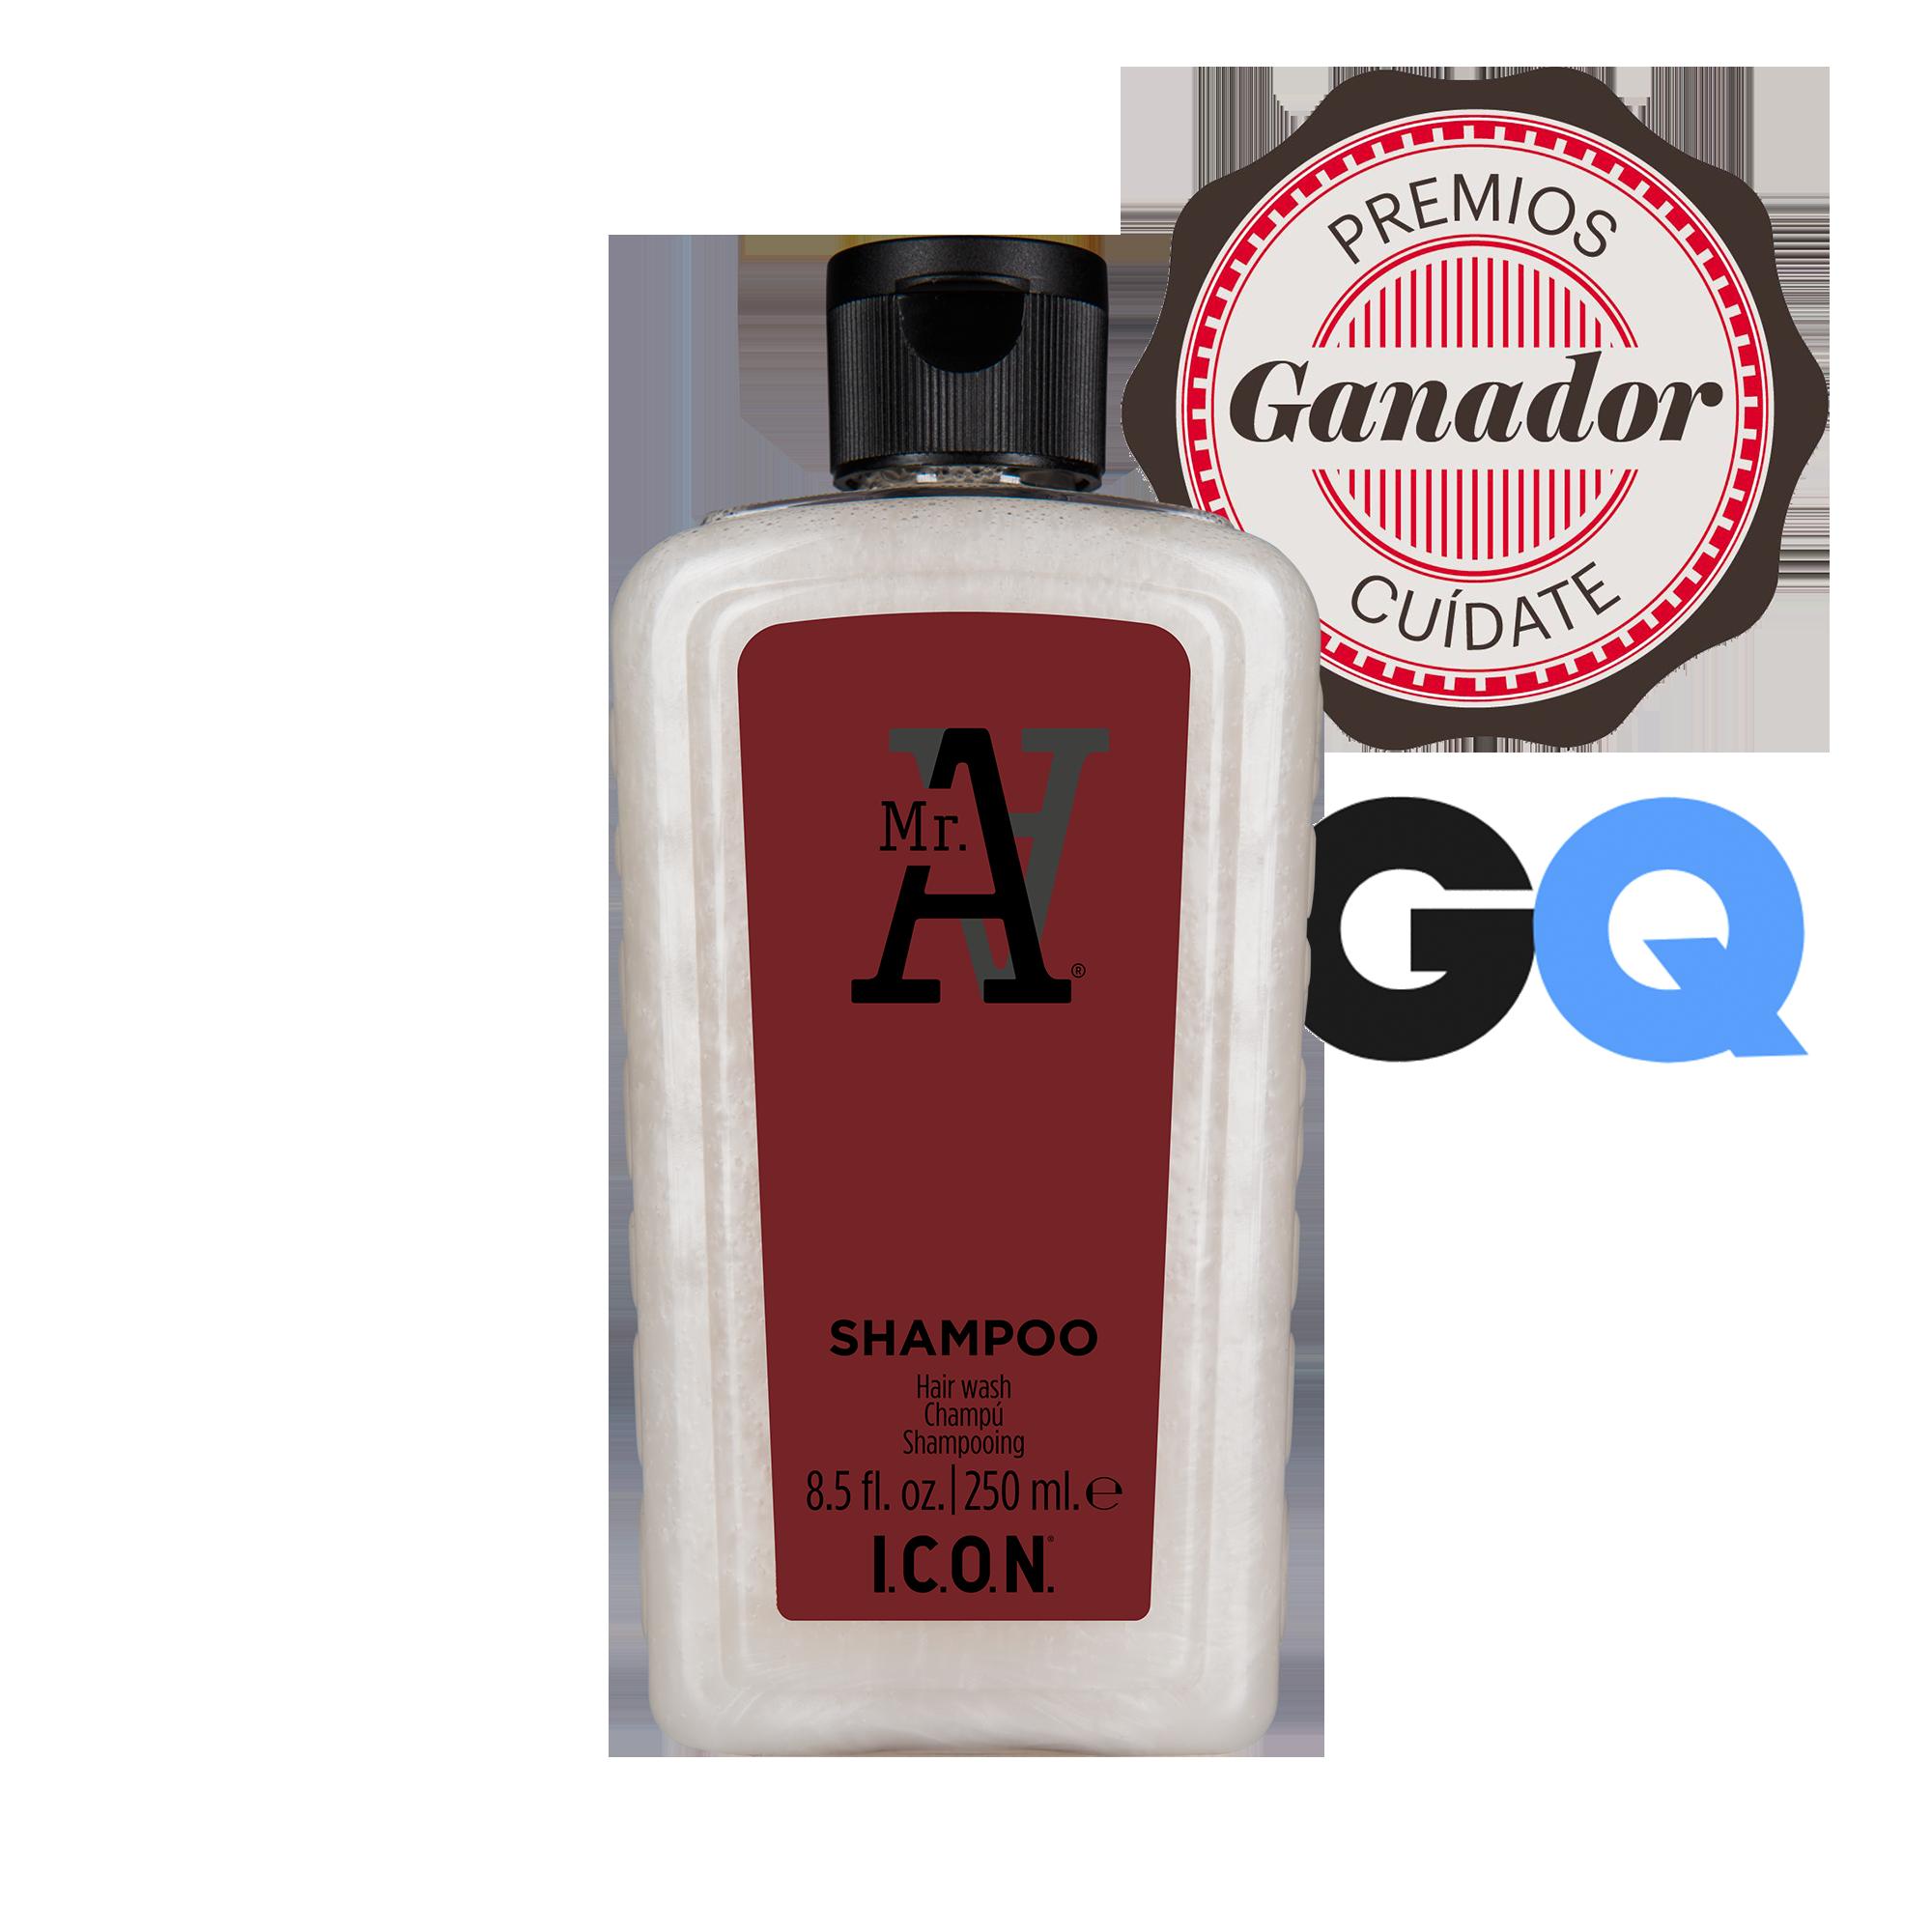 Mr. A Shampoo | I.C.O.N. Products | Champú para hombres